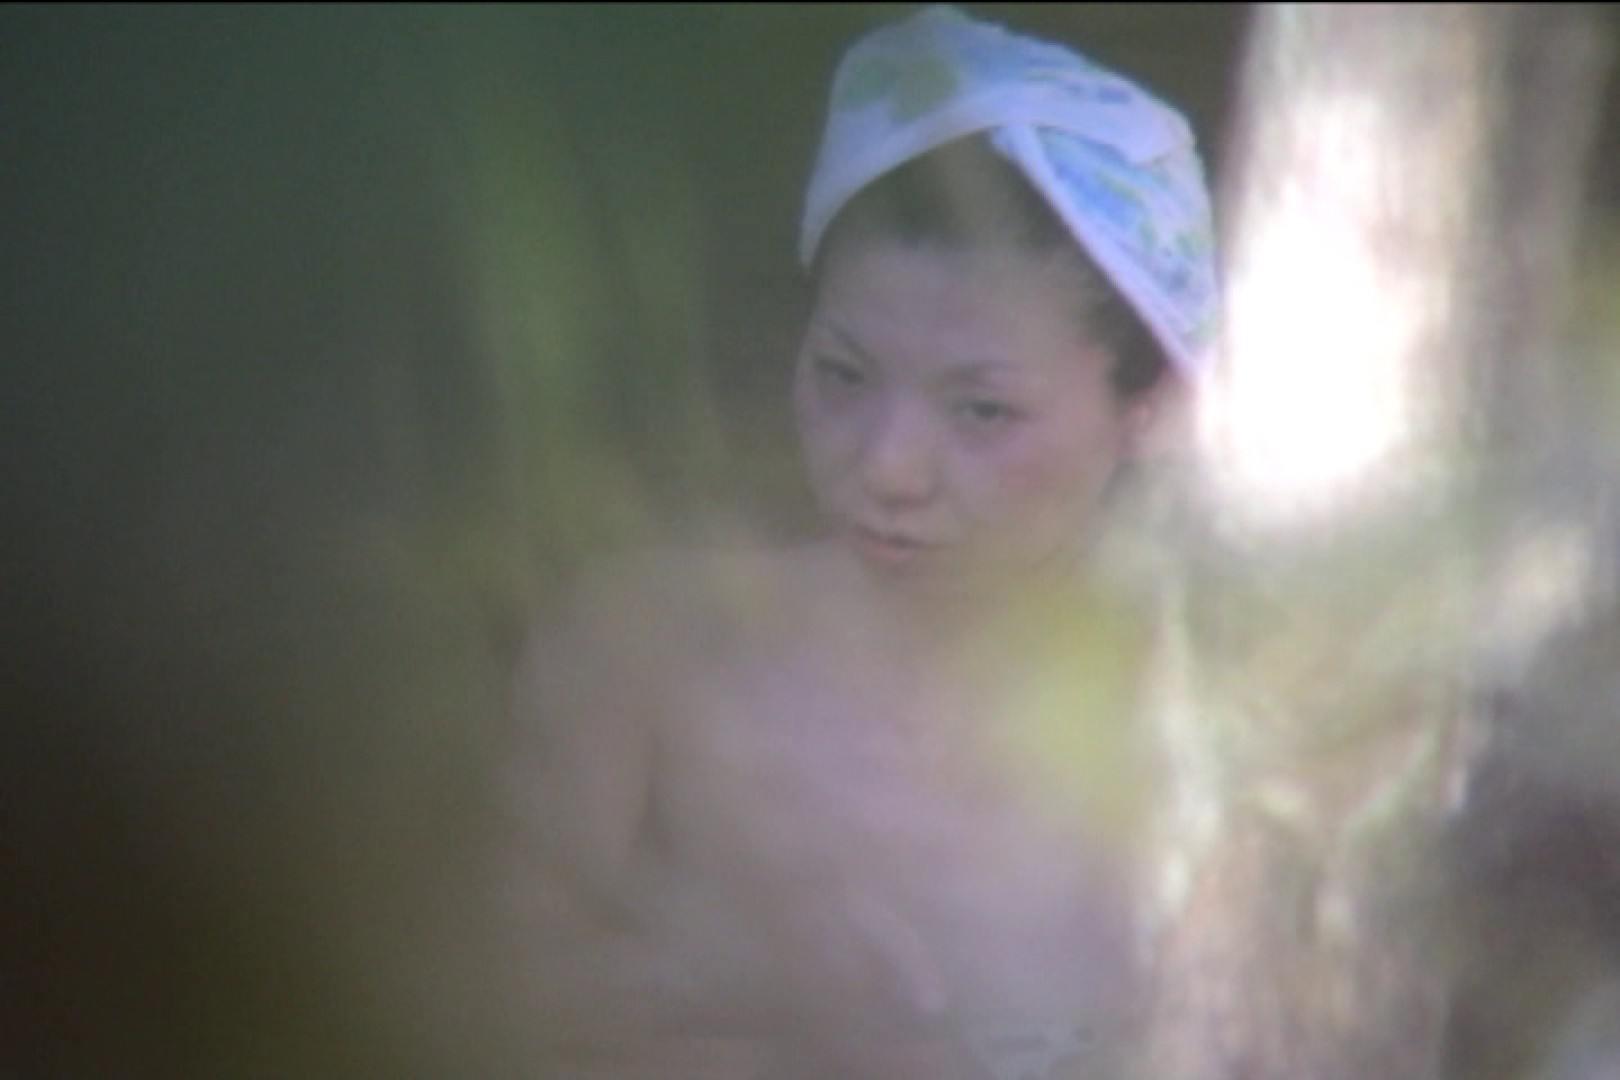 Aquaな露天風呂Vol.450 0  92連発 72